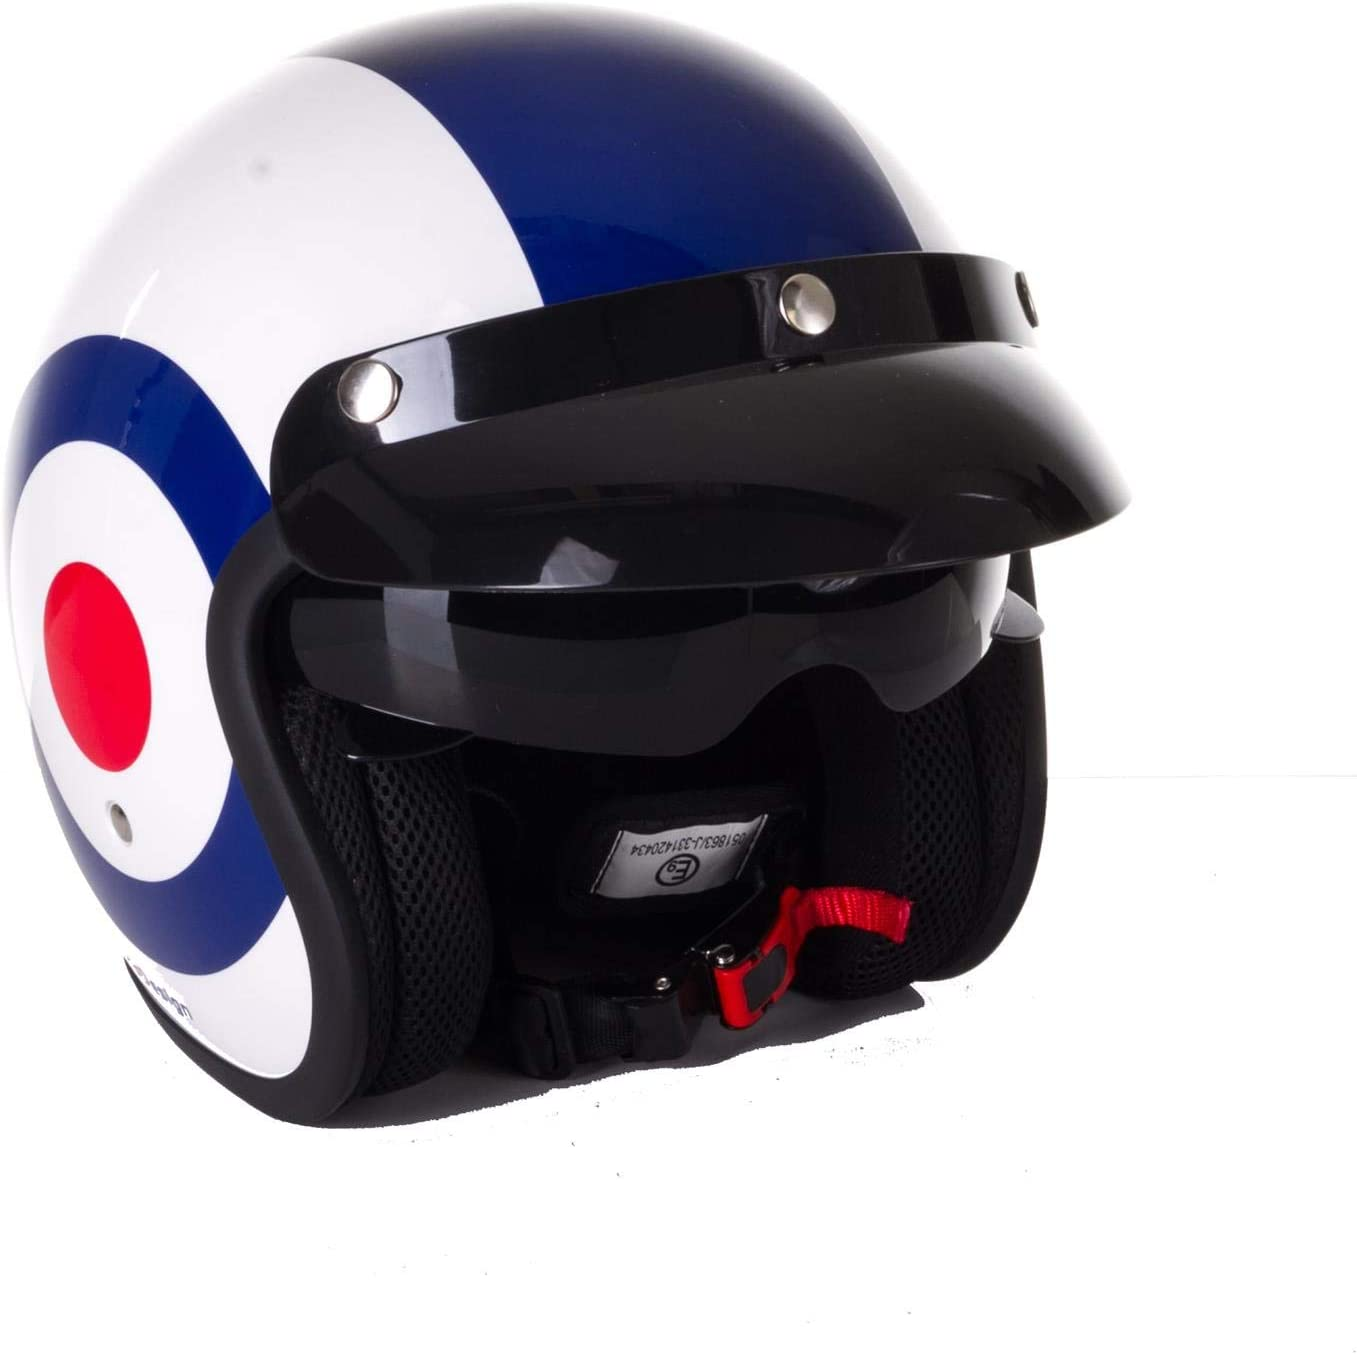 Motorbike Motorcycle Open Face Jet Touring Helmet Seatbelt Fastener XS TargetUJ